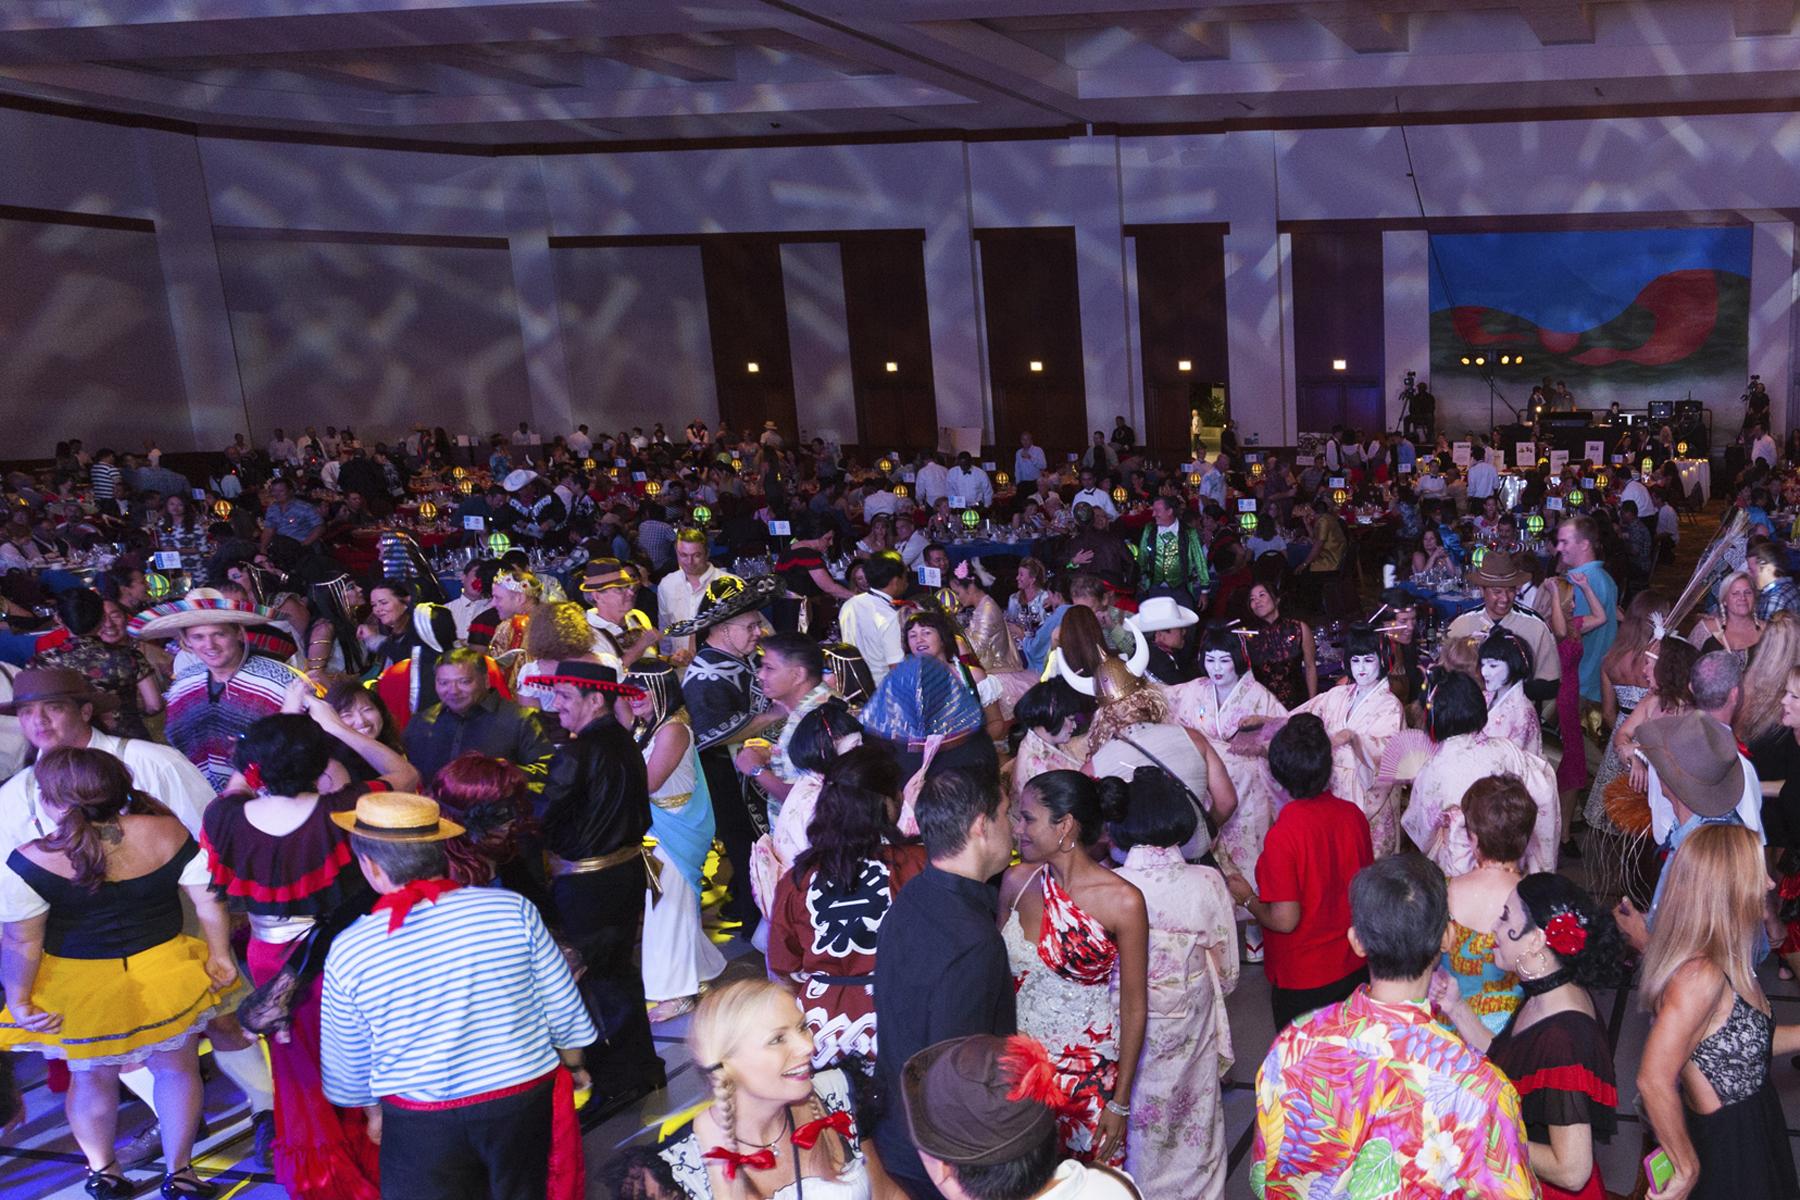 2016 AN EVENING AROUND THE WORLD: A packed dance floor!